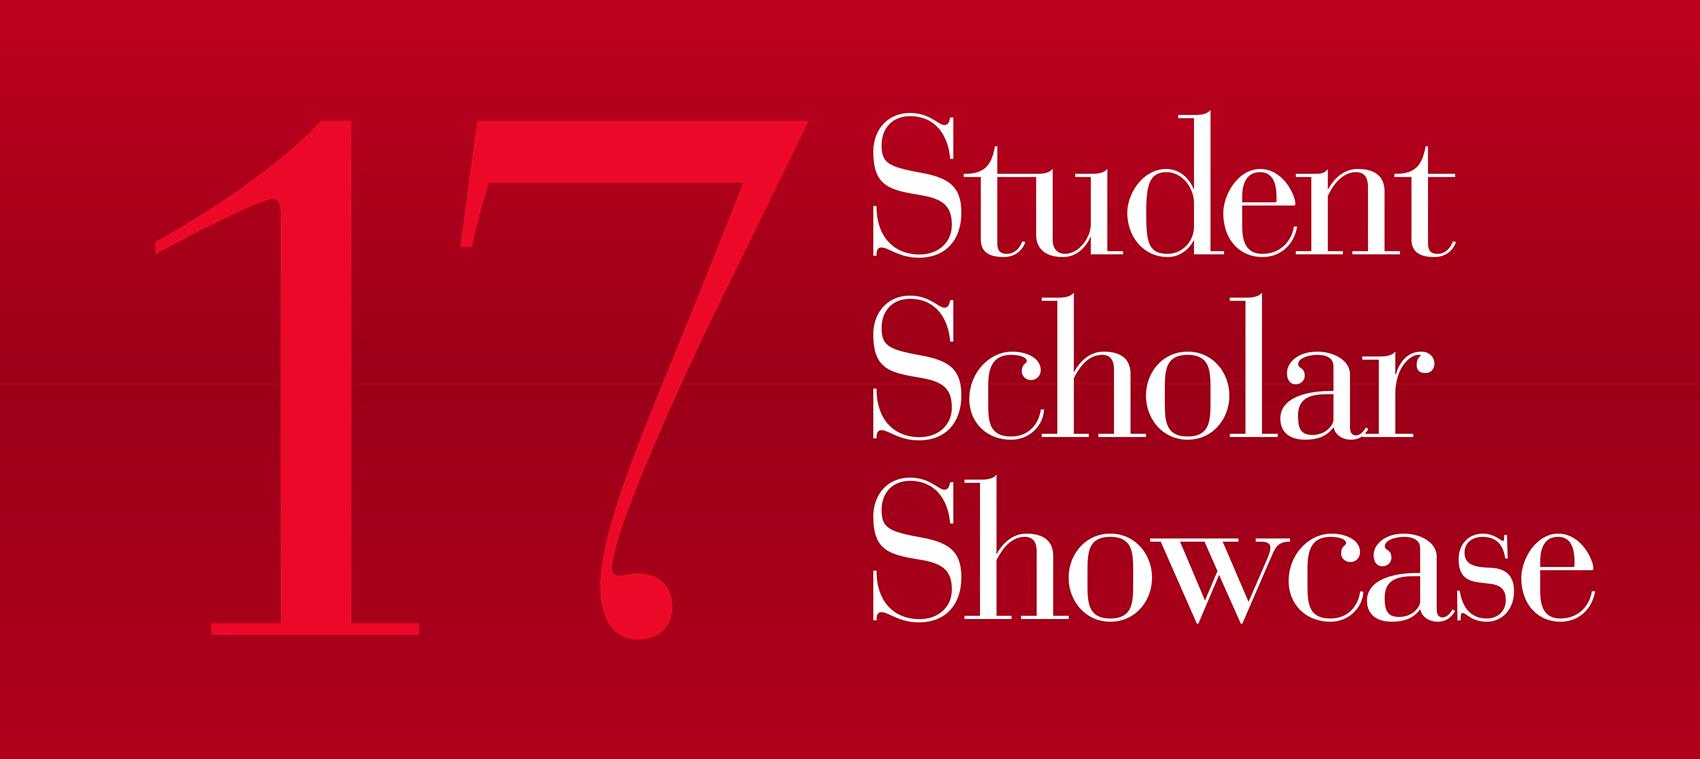 20th annual student scholar showcase celebrates academic